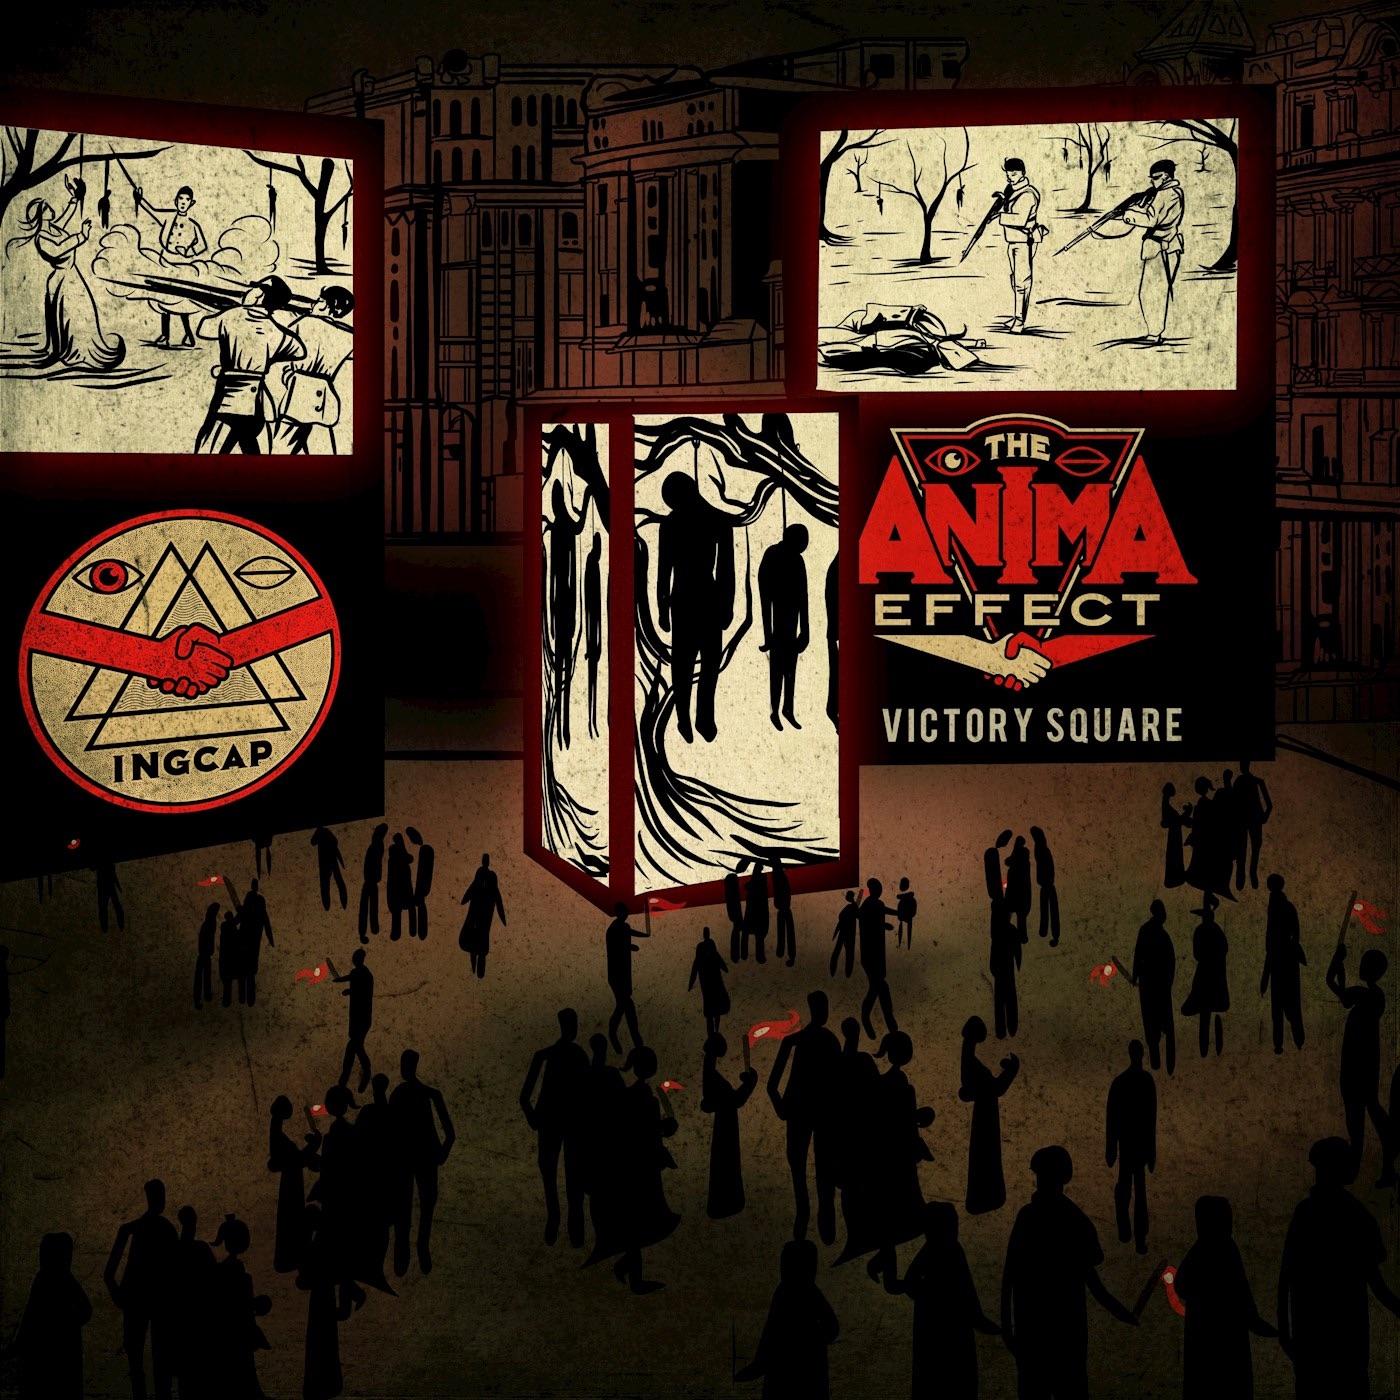 The Anima Effect - Victory Square [single] (2020)